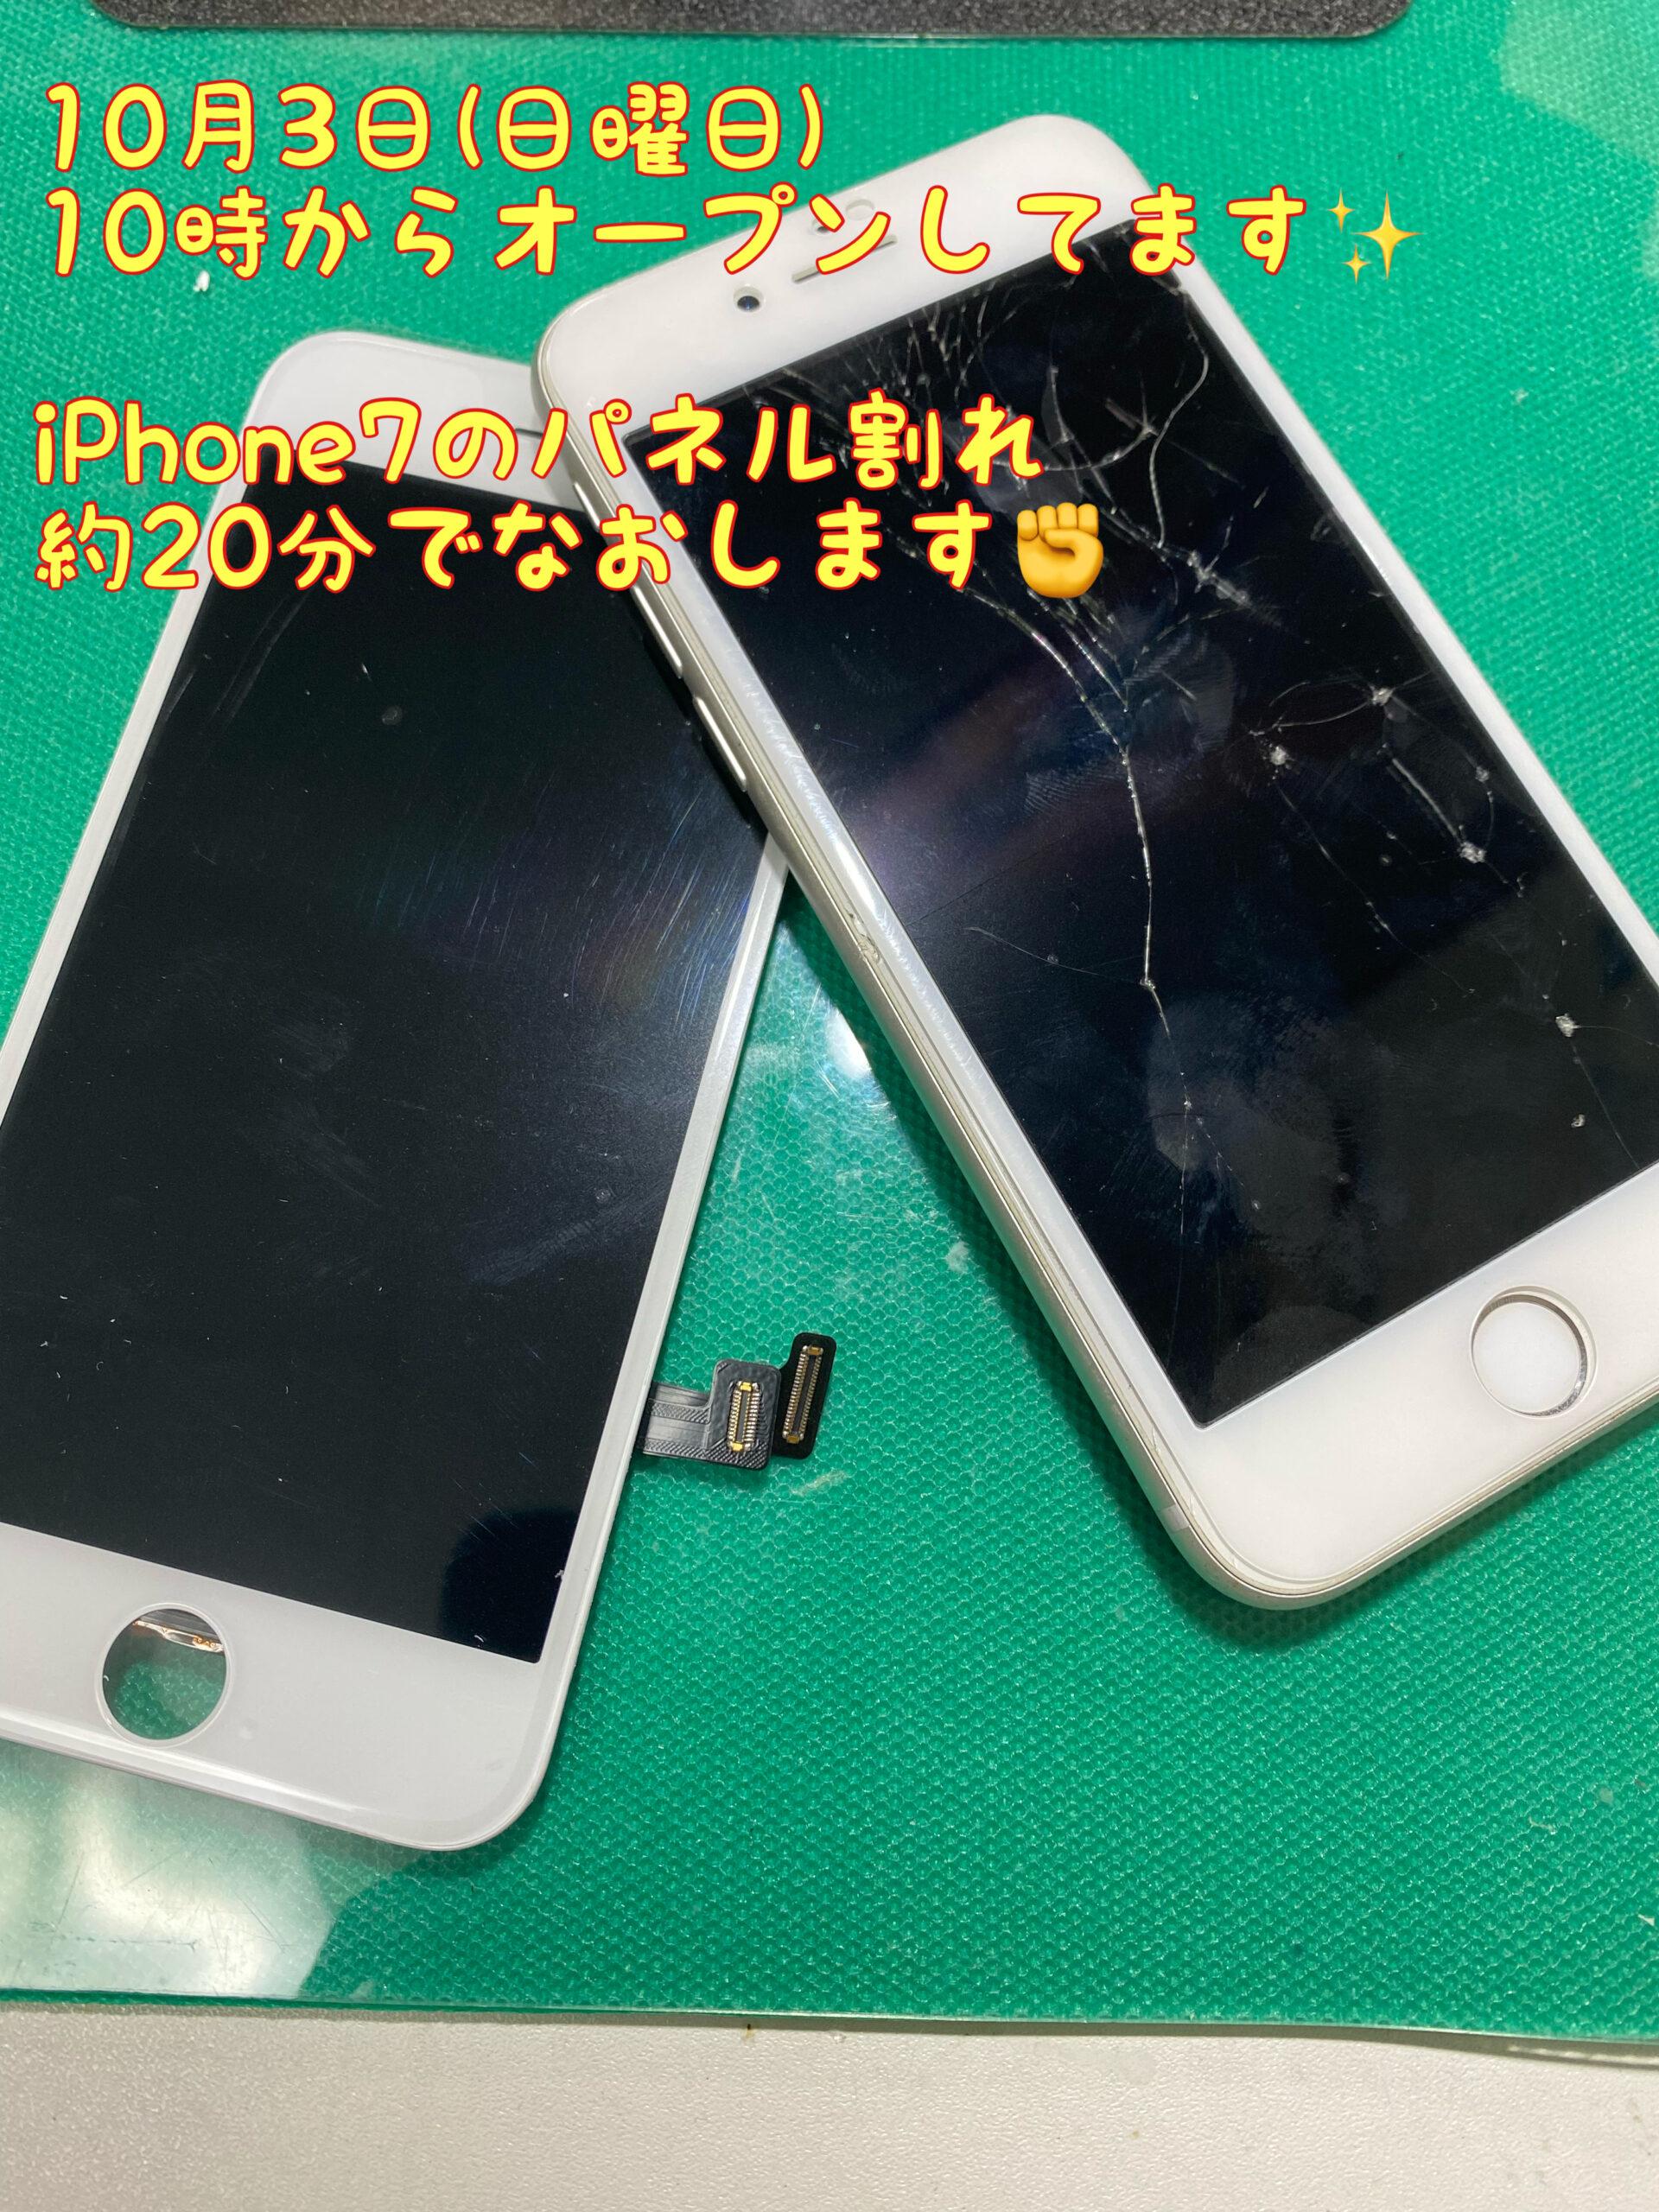 iPhone修理 アイフォン修理 スマホ修理 江南市 江南 扶桑 大口 犬山 岩倉 iPhone13